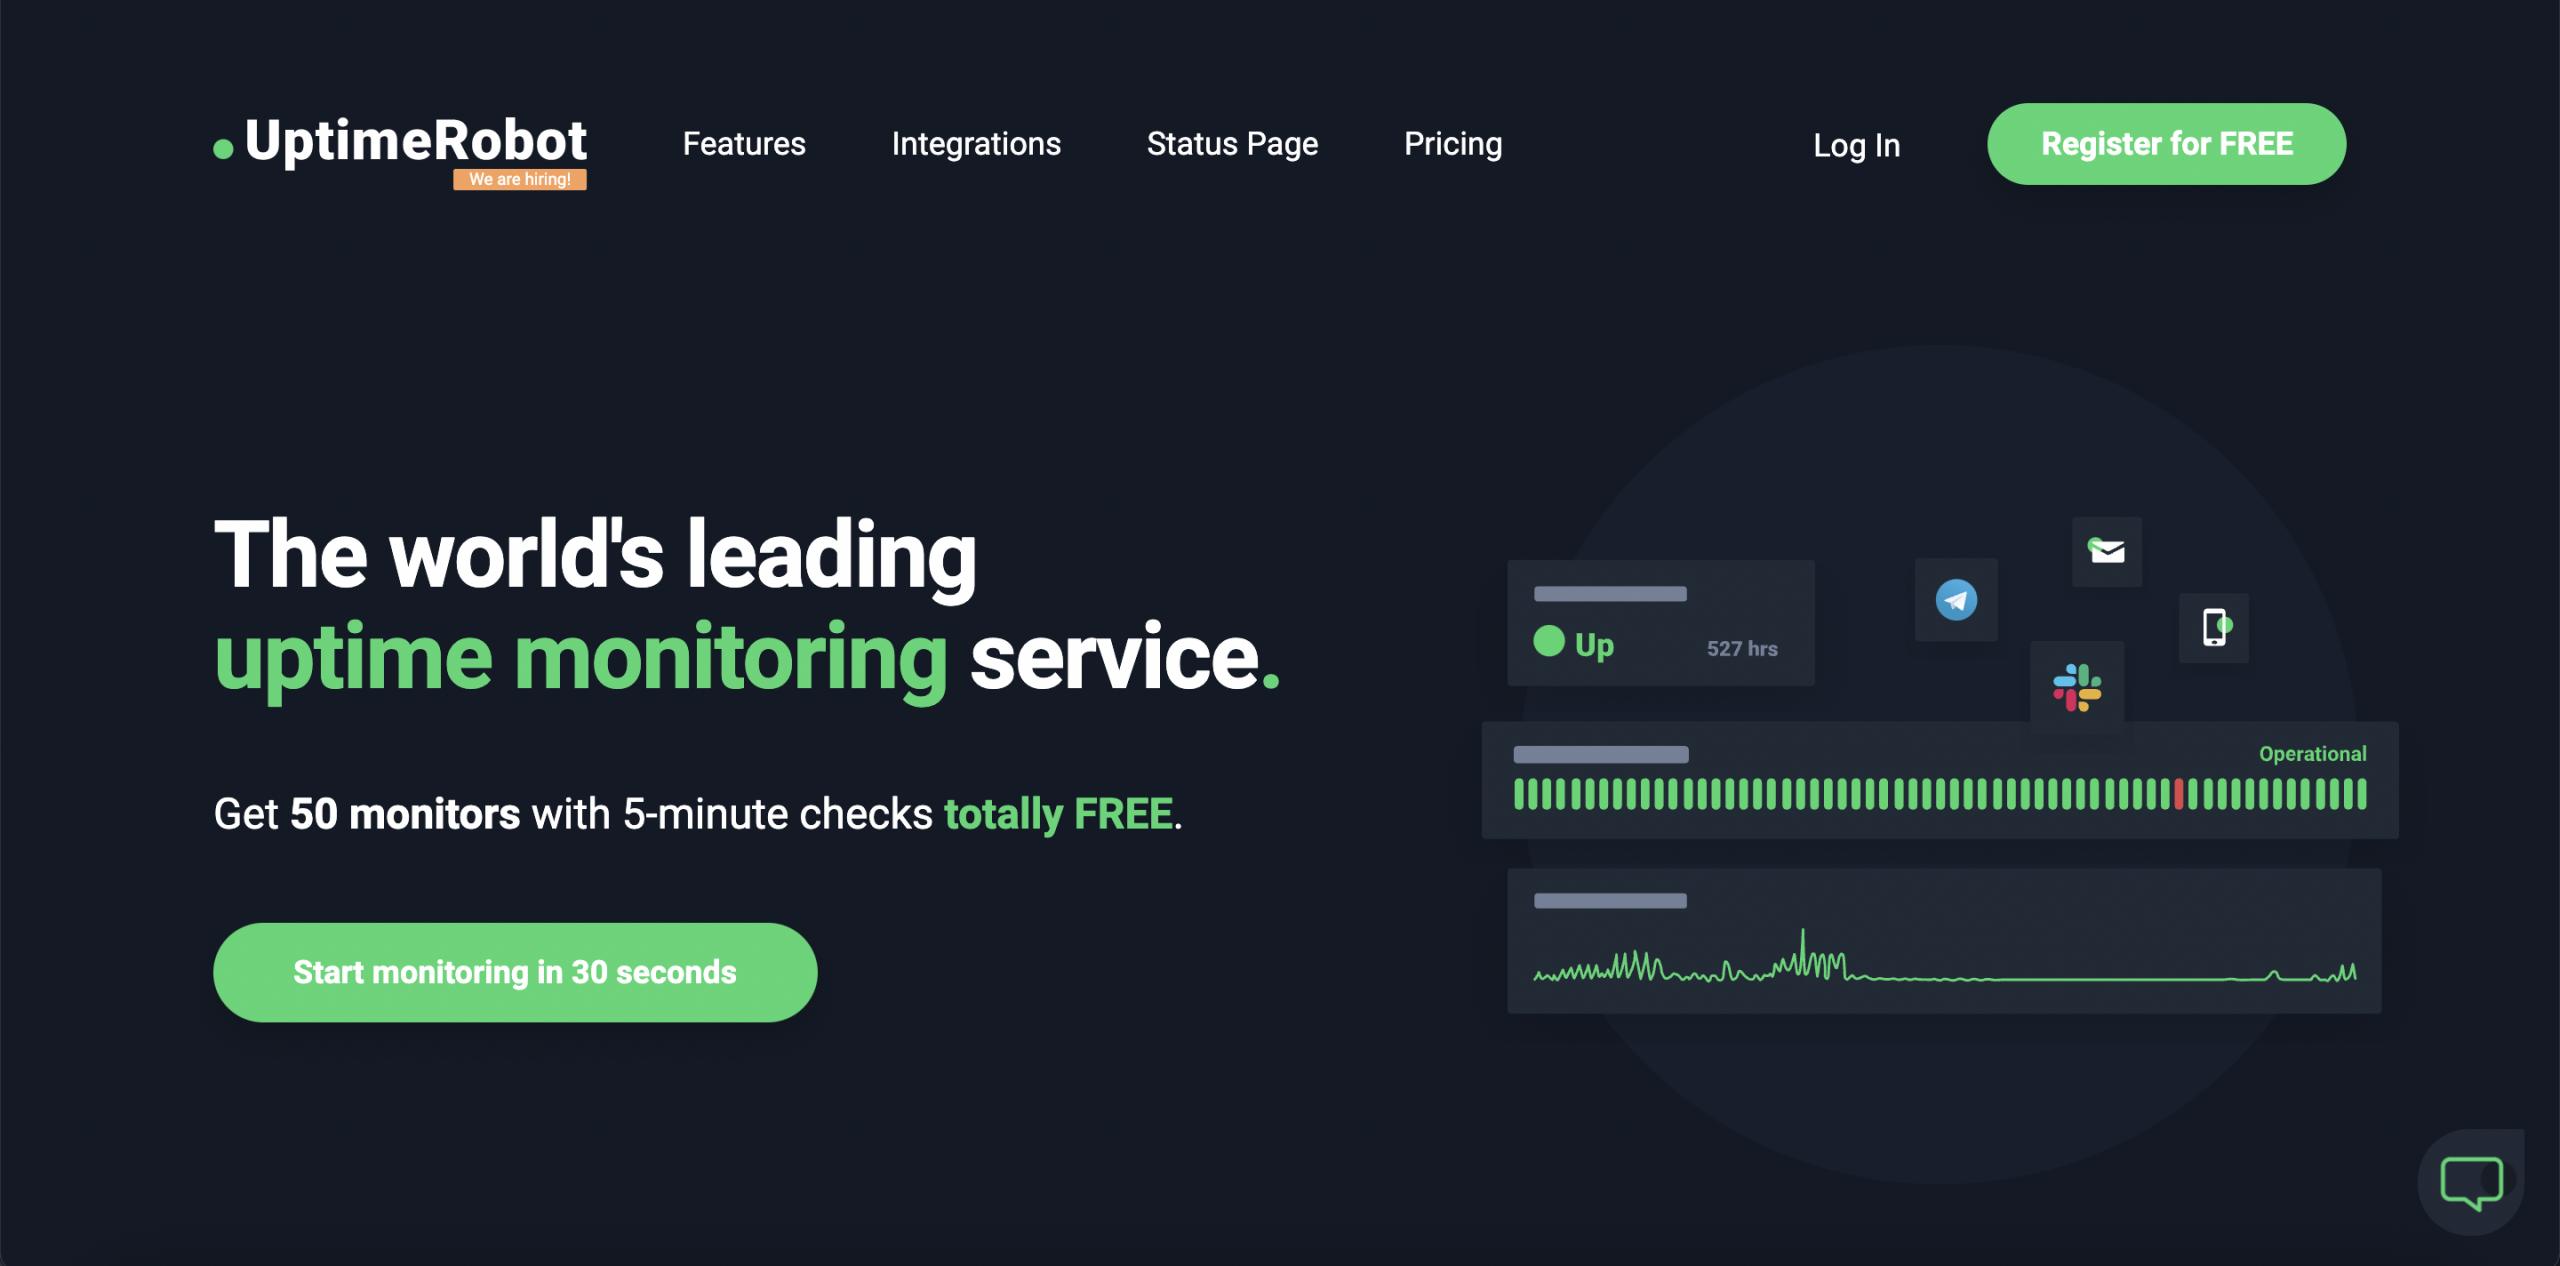 UptimeRobot - Top 10 Best Website Monitoring Services of 2021 - HostNamaste